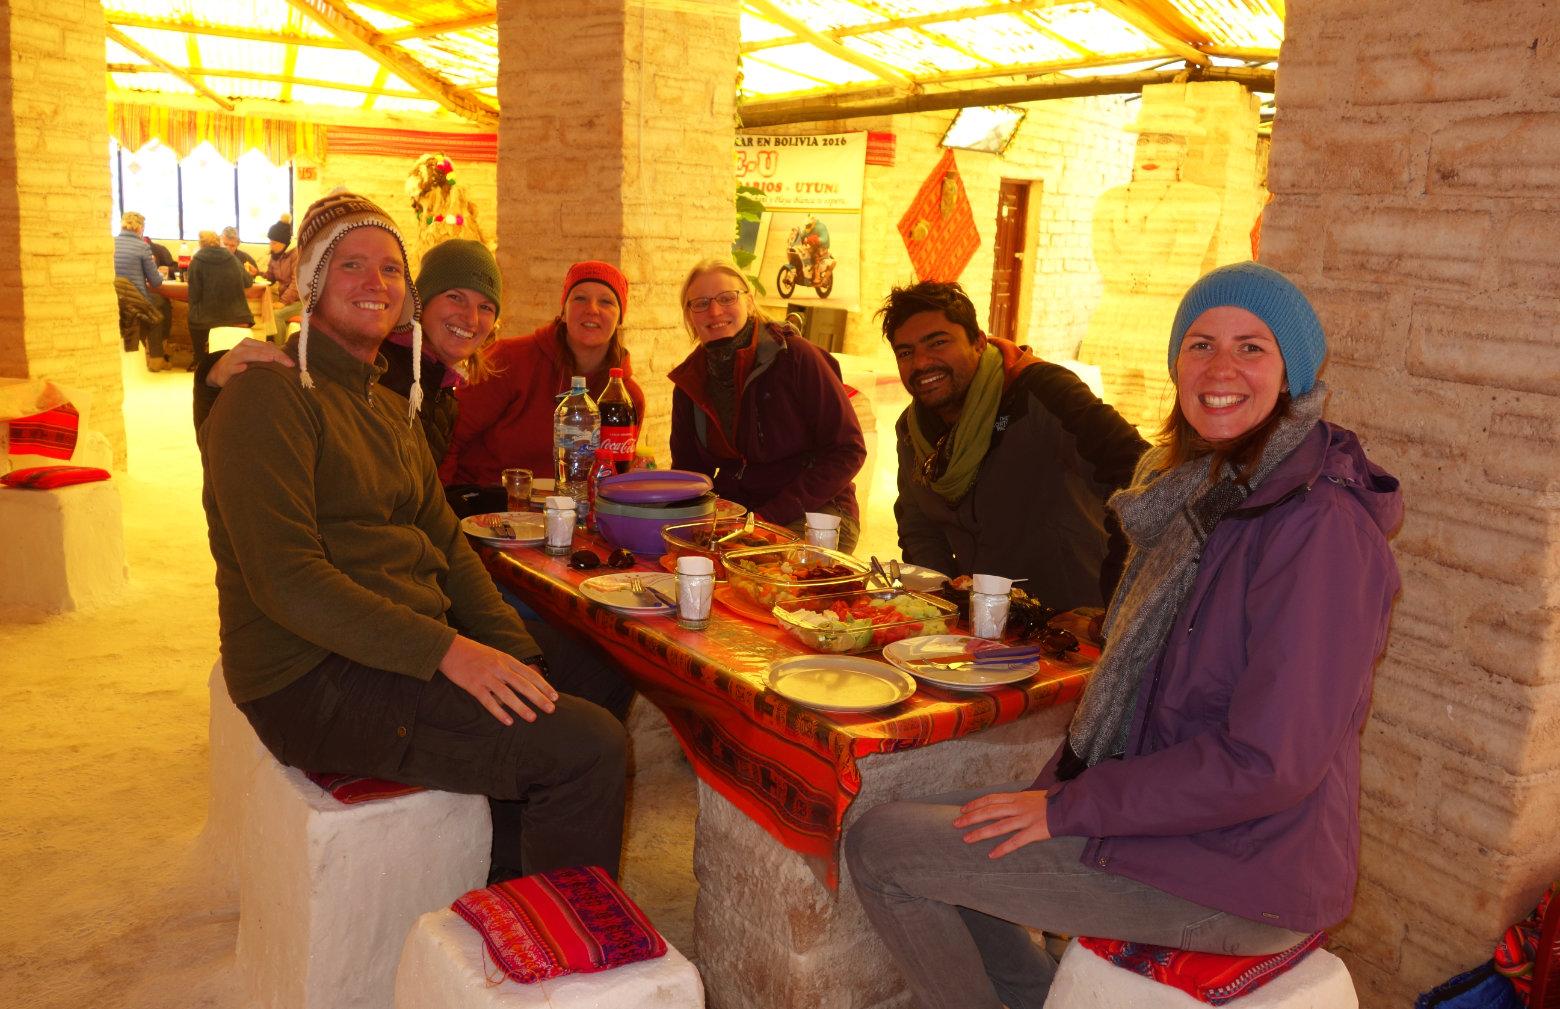 Bolivien Salar de Uyuni Essen Salzhotel